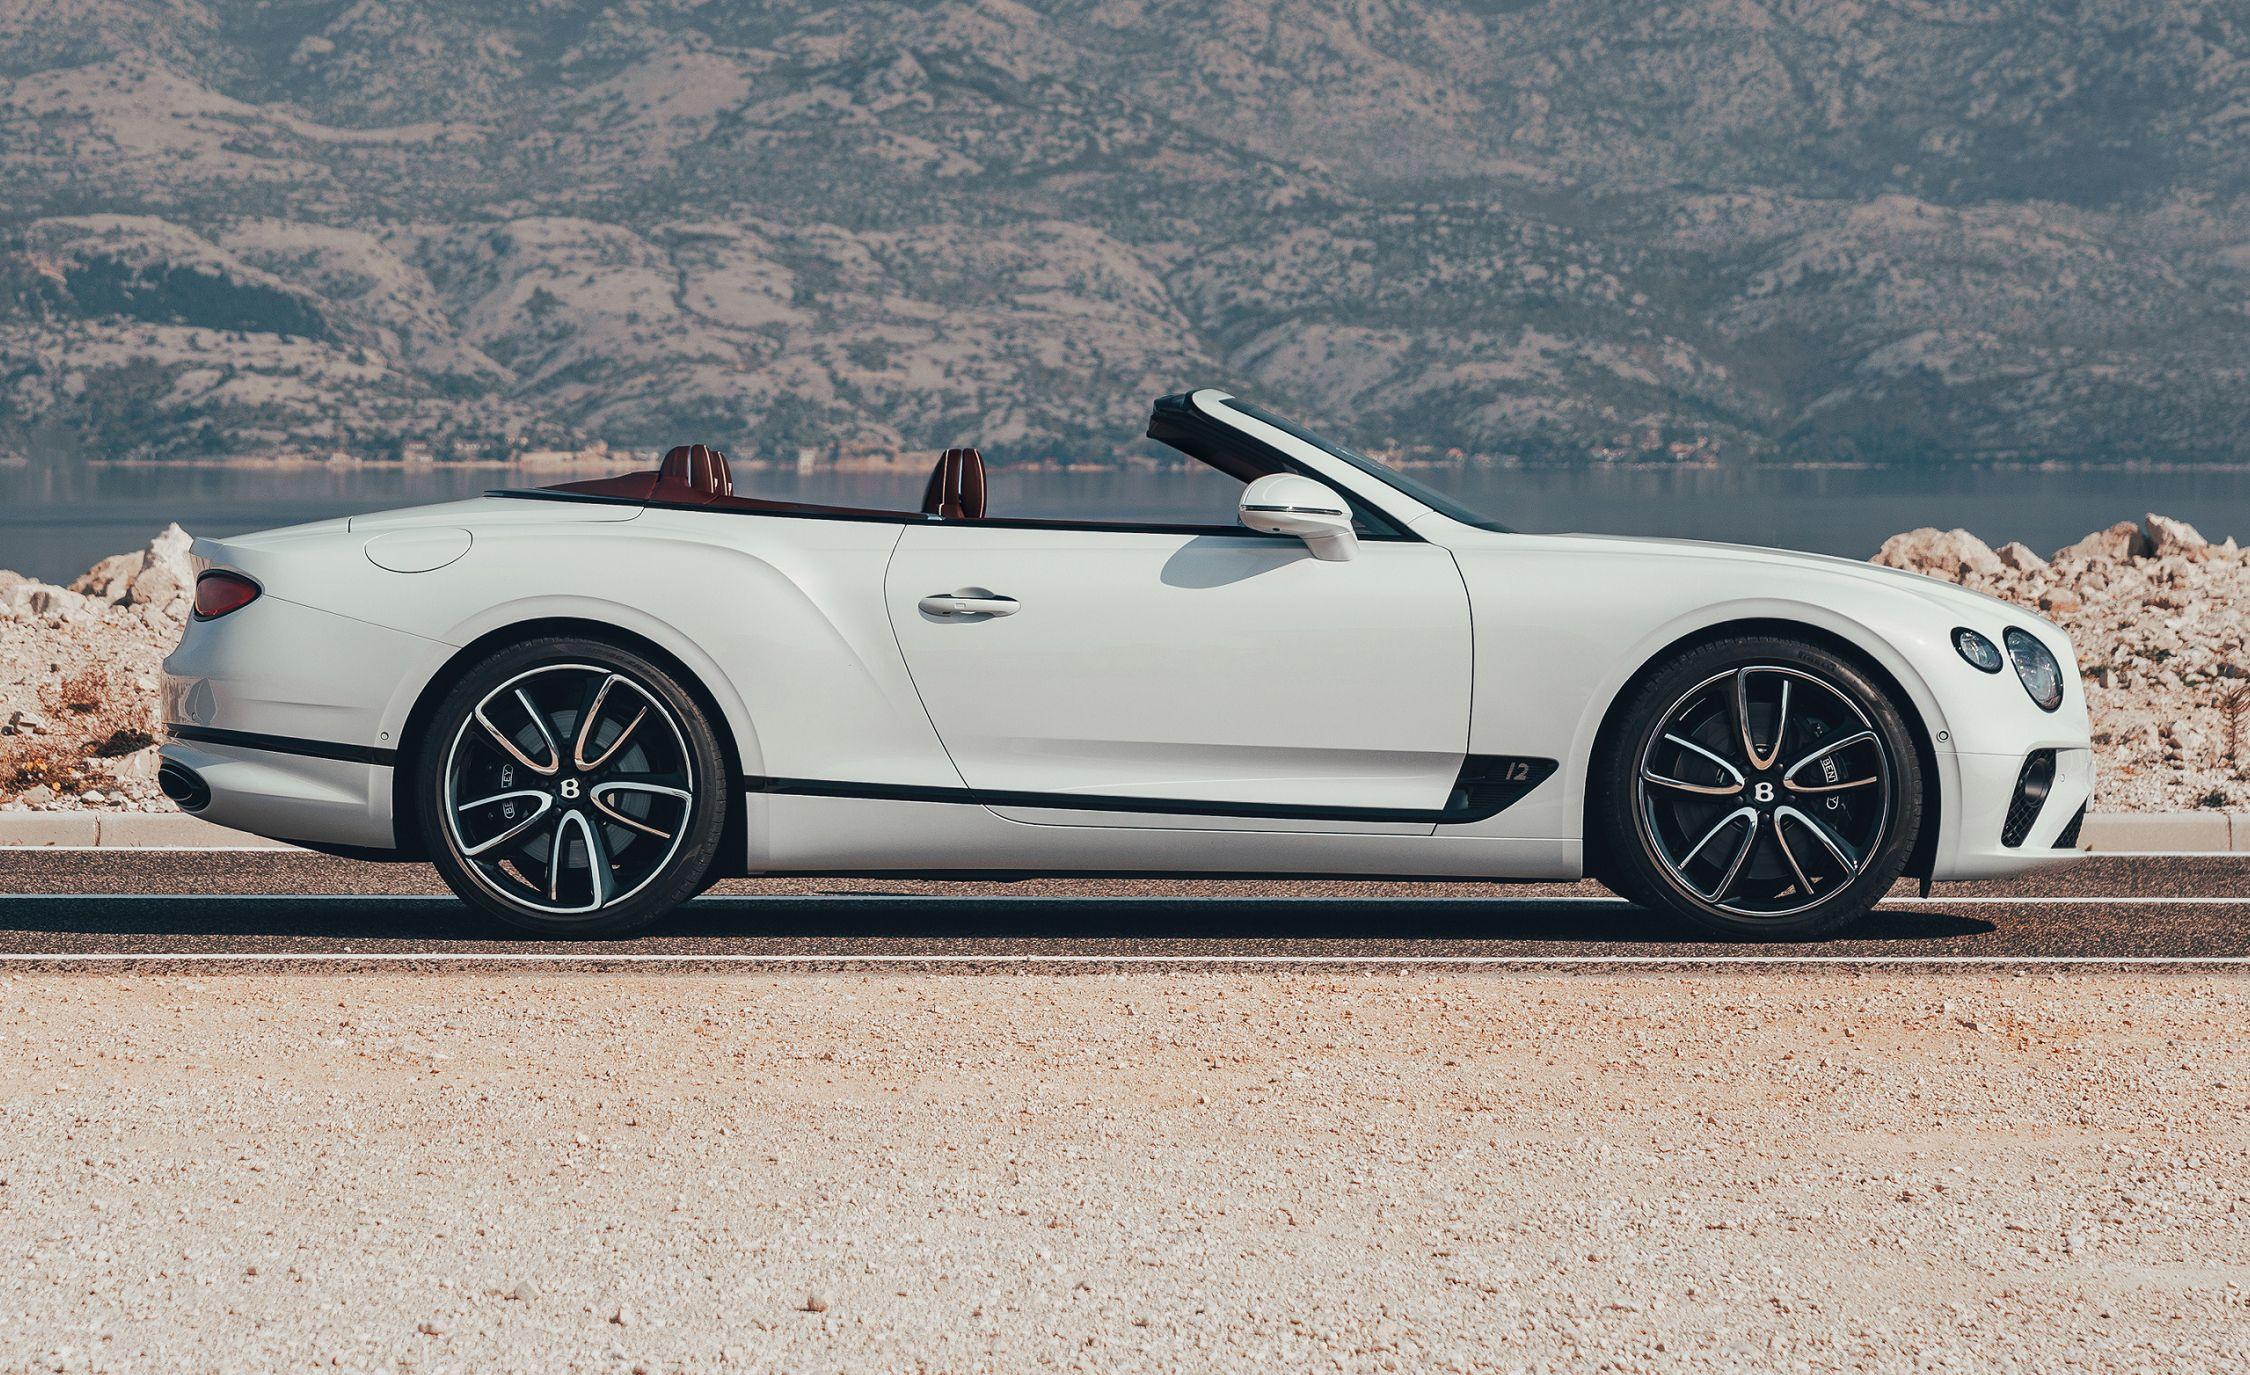 2019 Bentley Continental Gt Reviews Bentley Continental Gt Price